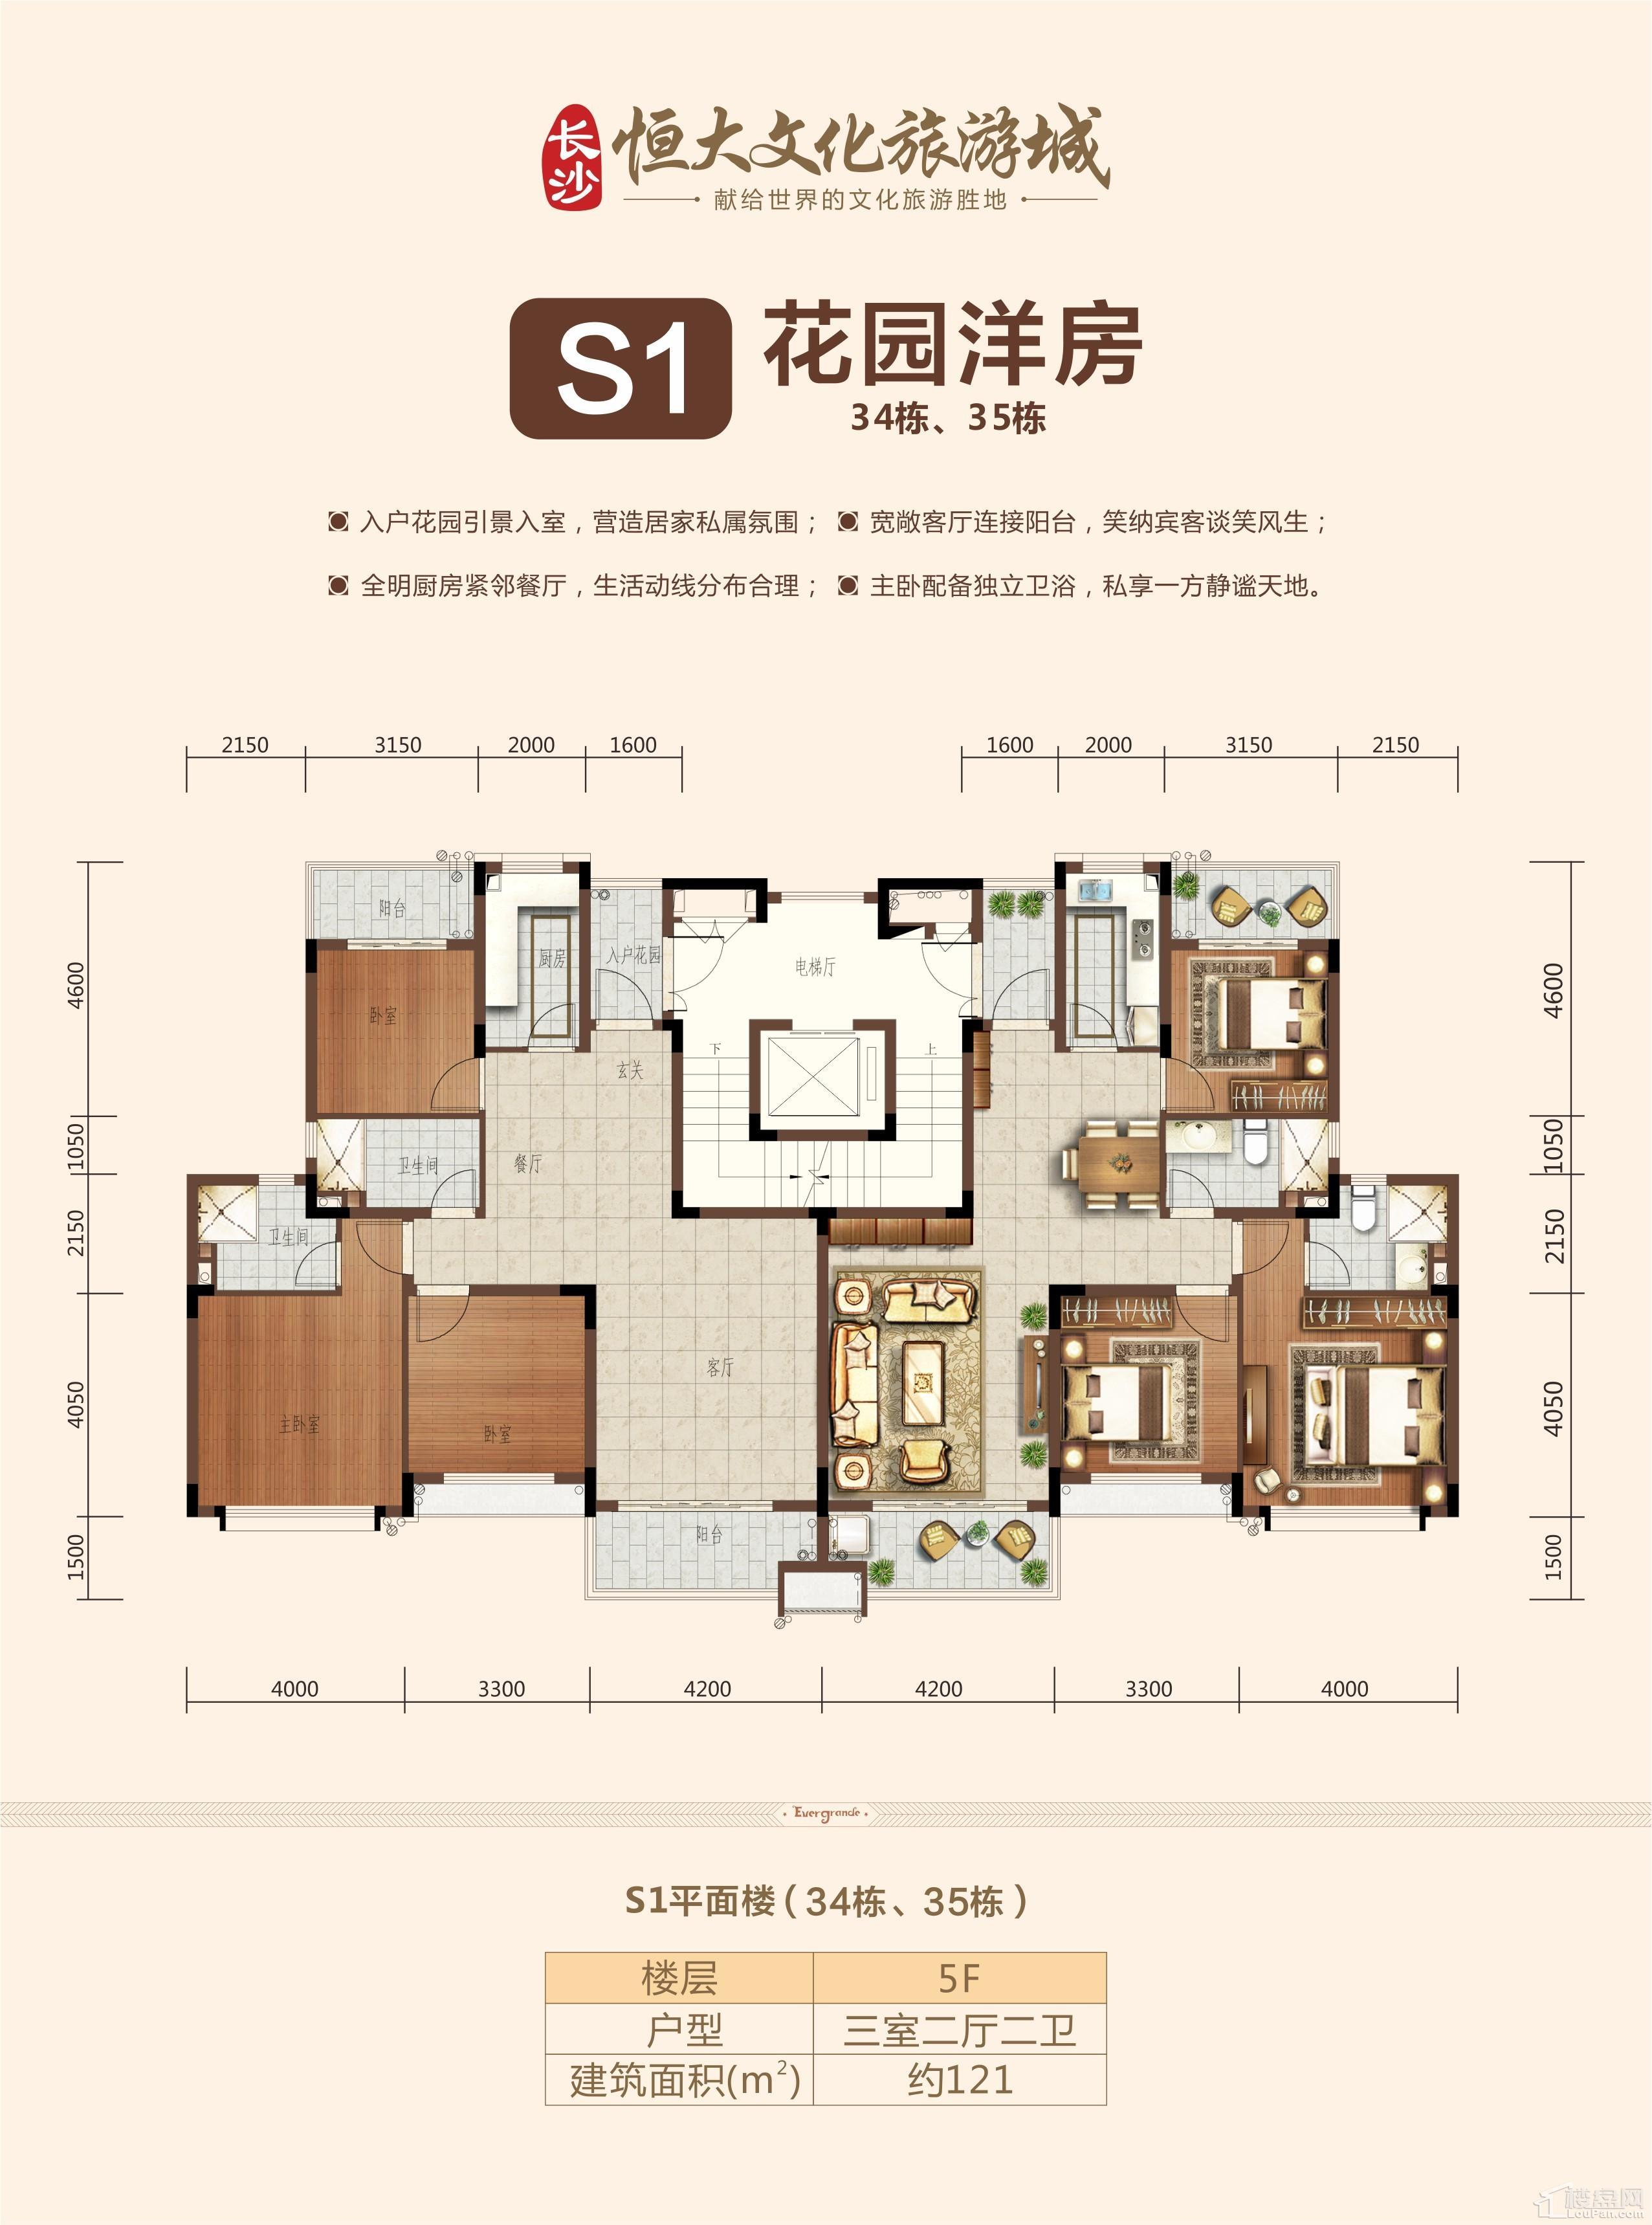 S1花园洋房五层